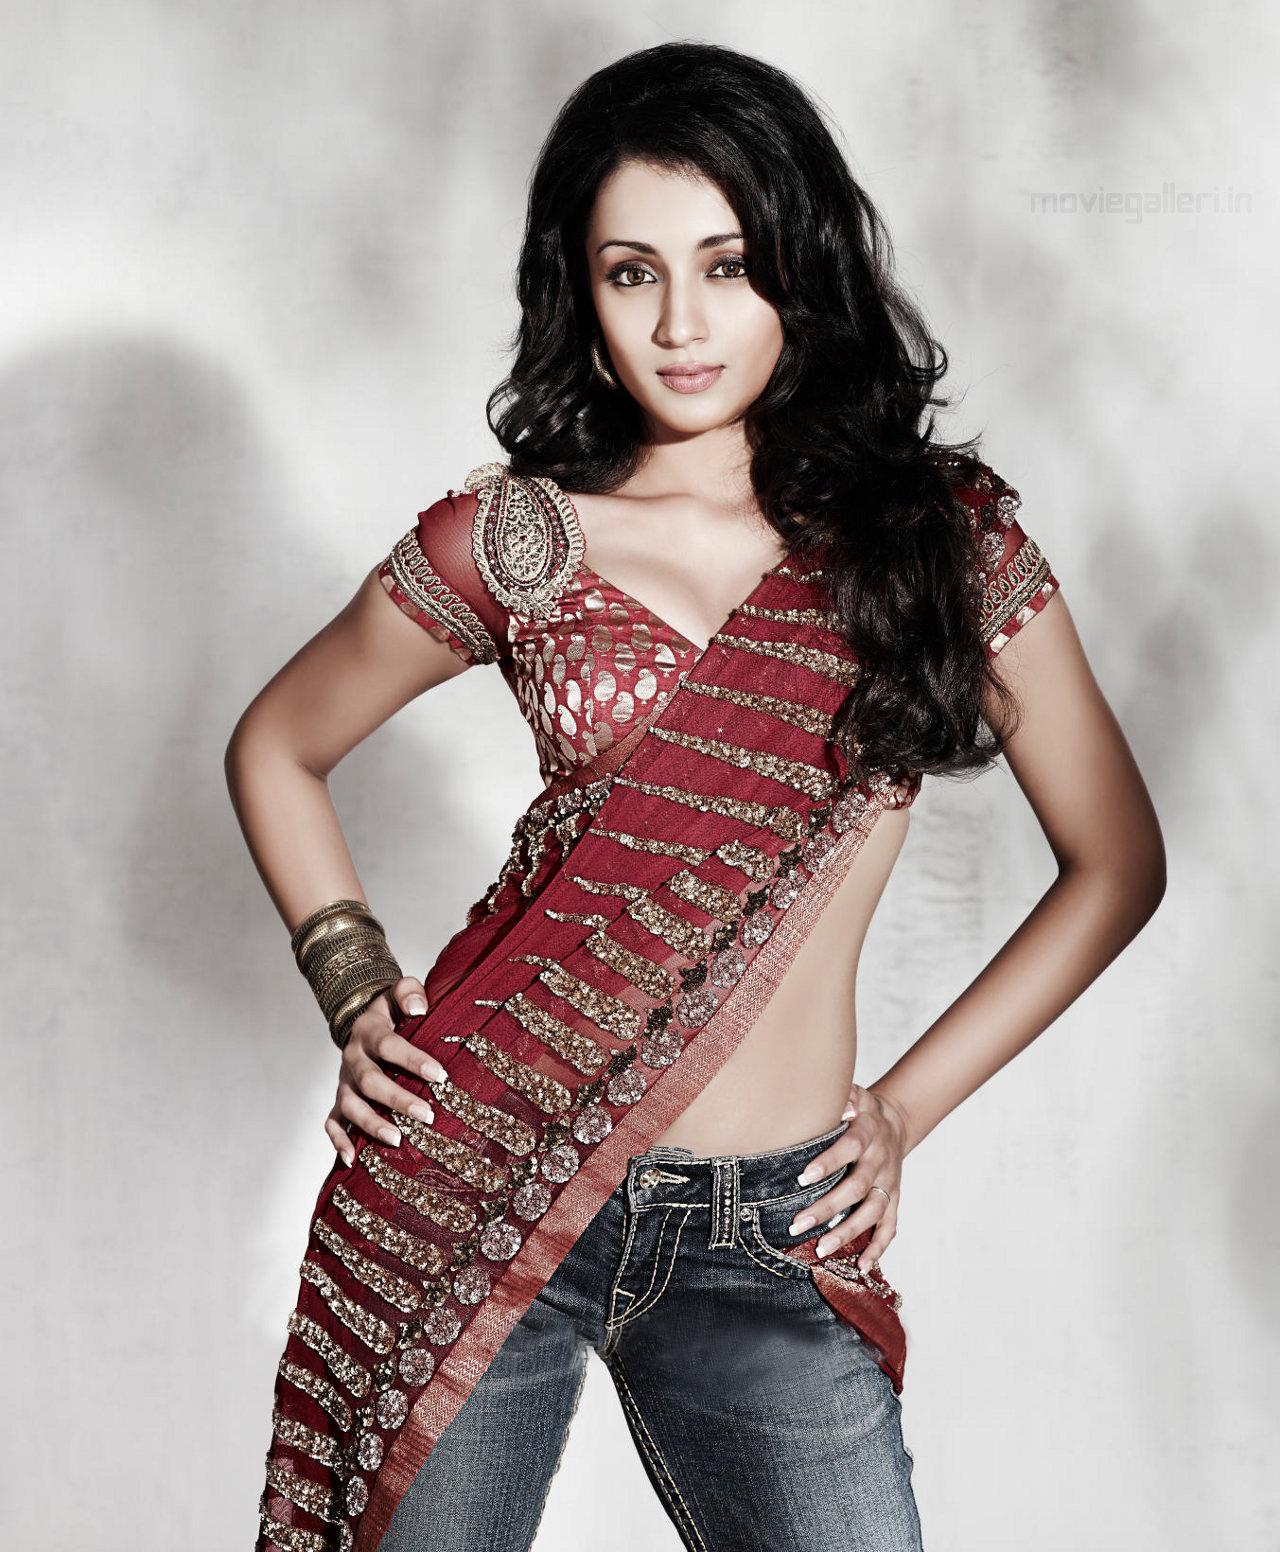 Hq Wallpapers Of Beautiful Indian Actress Trisha Krishnan